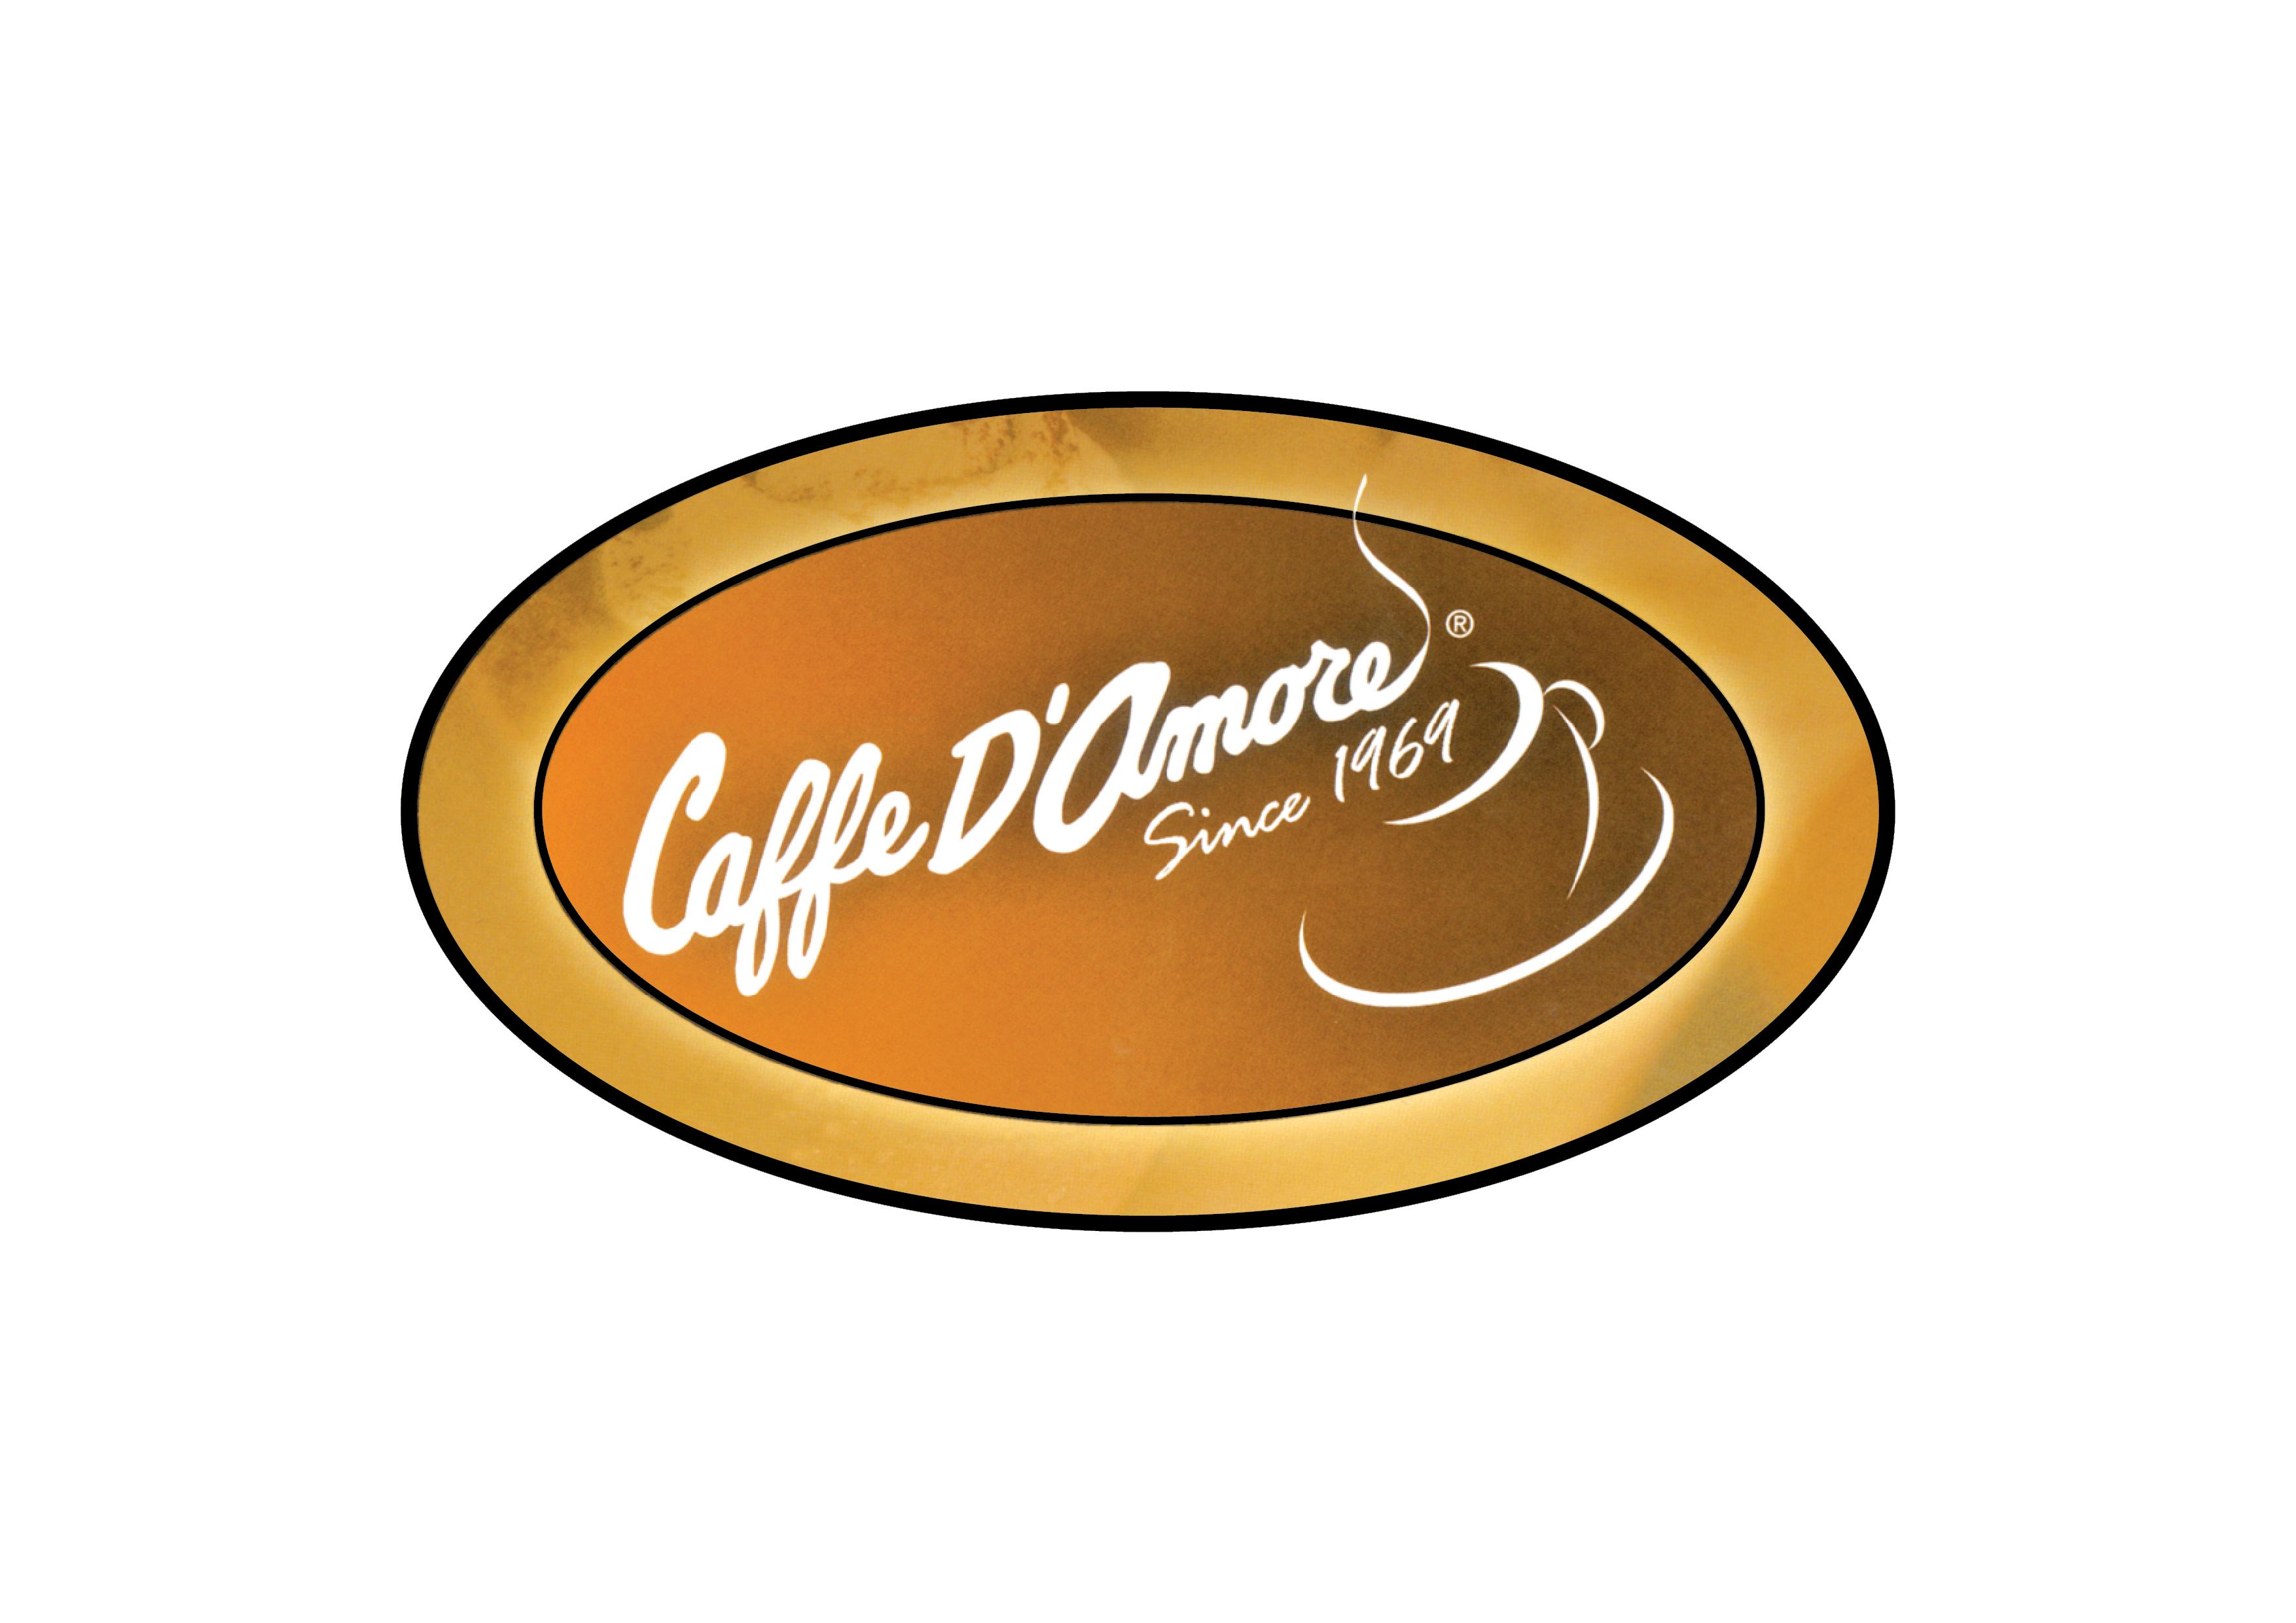 Caffe Damore